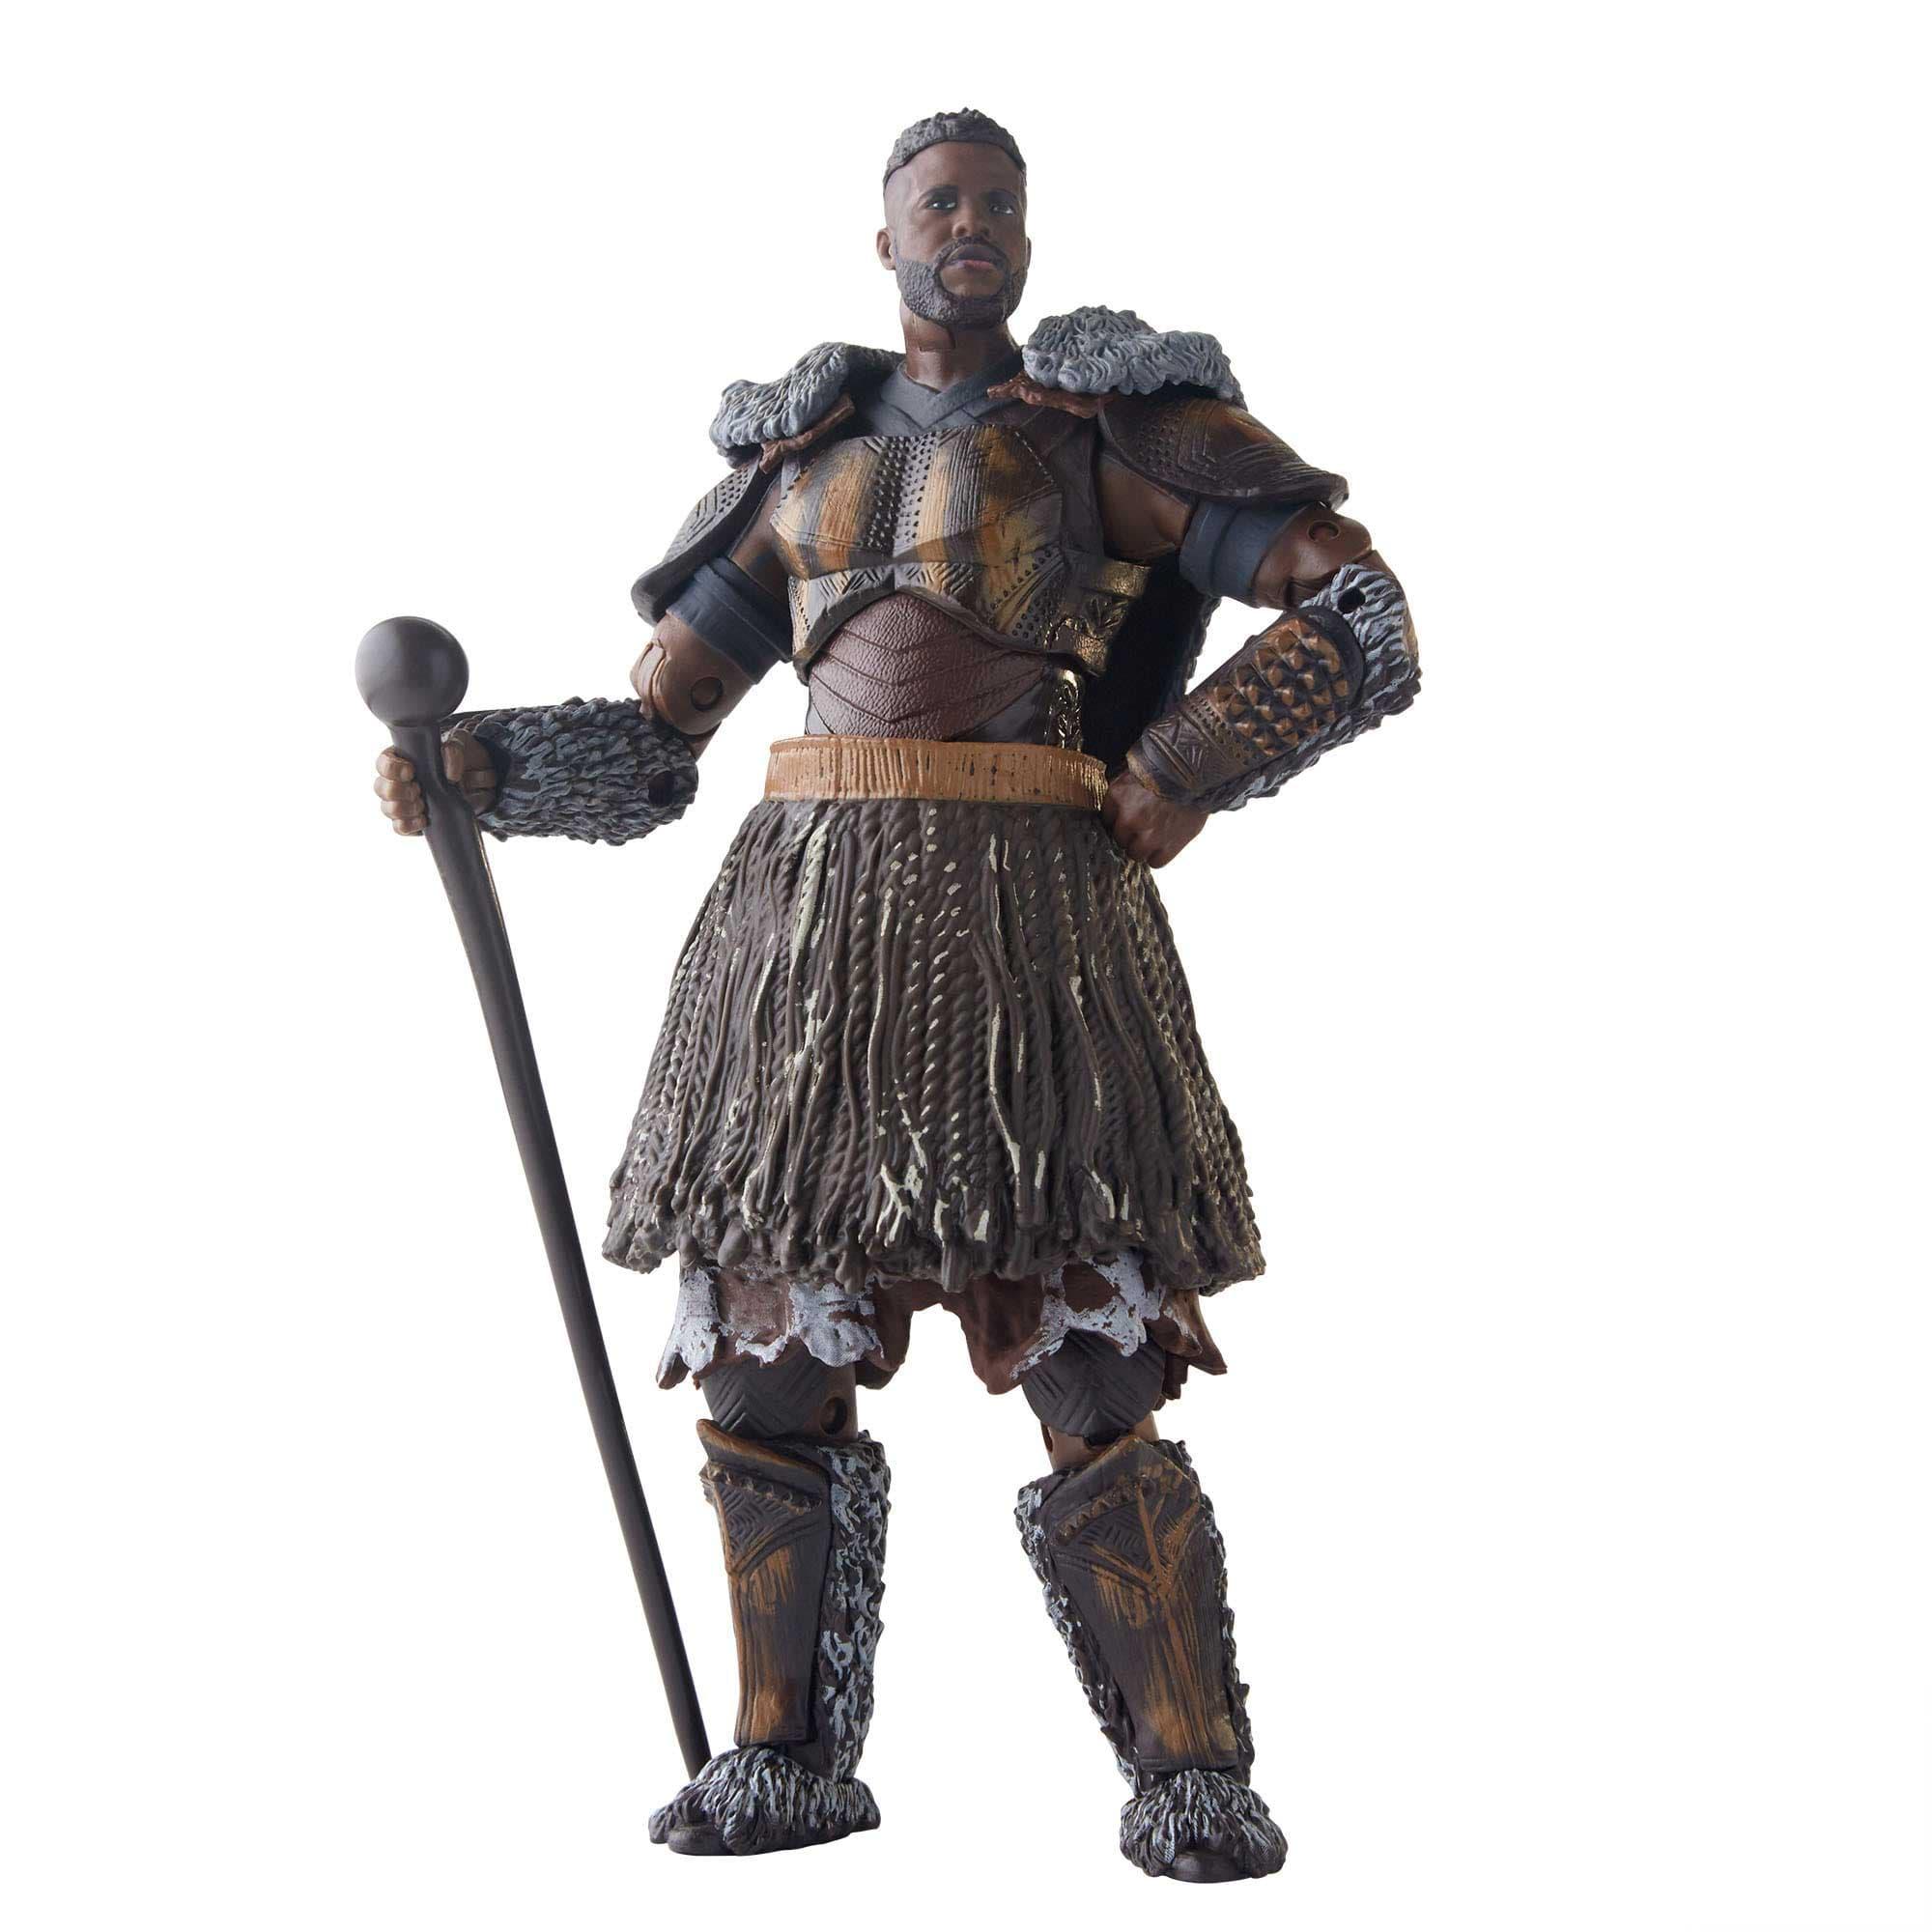 M'Baku Build-a-Figure